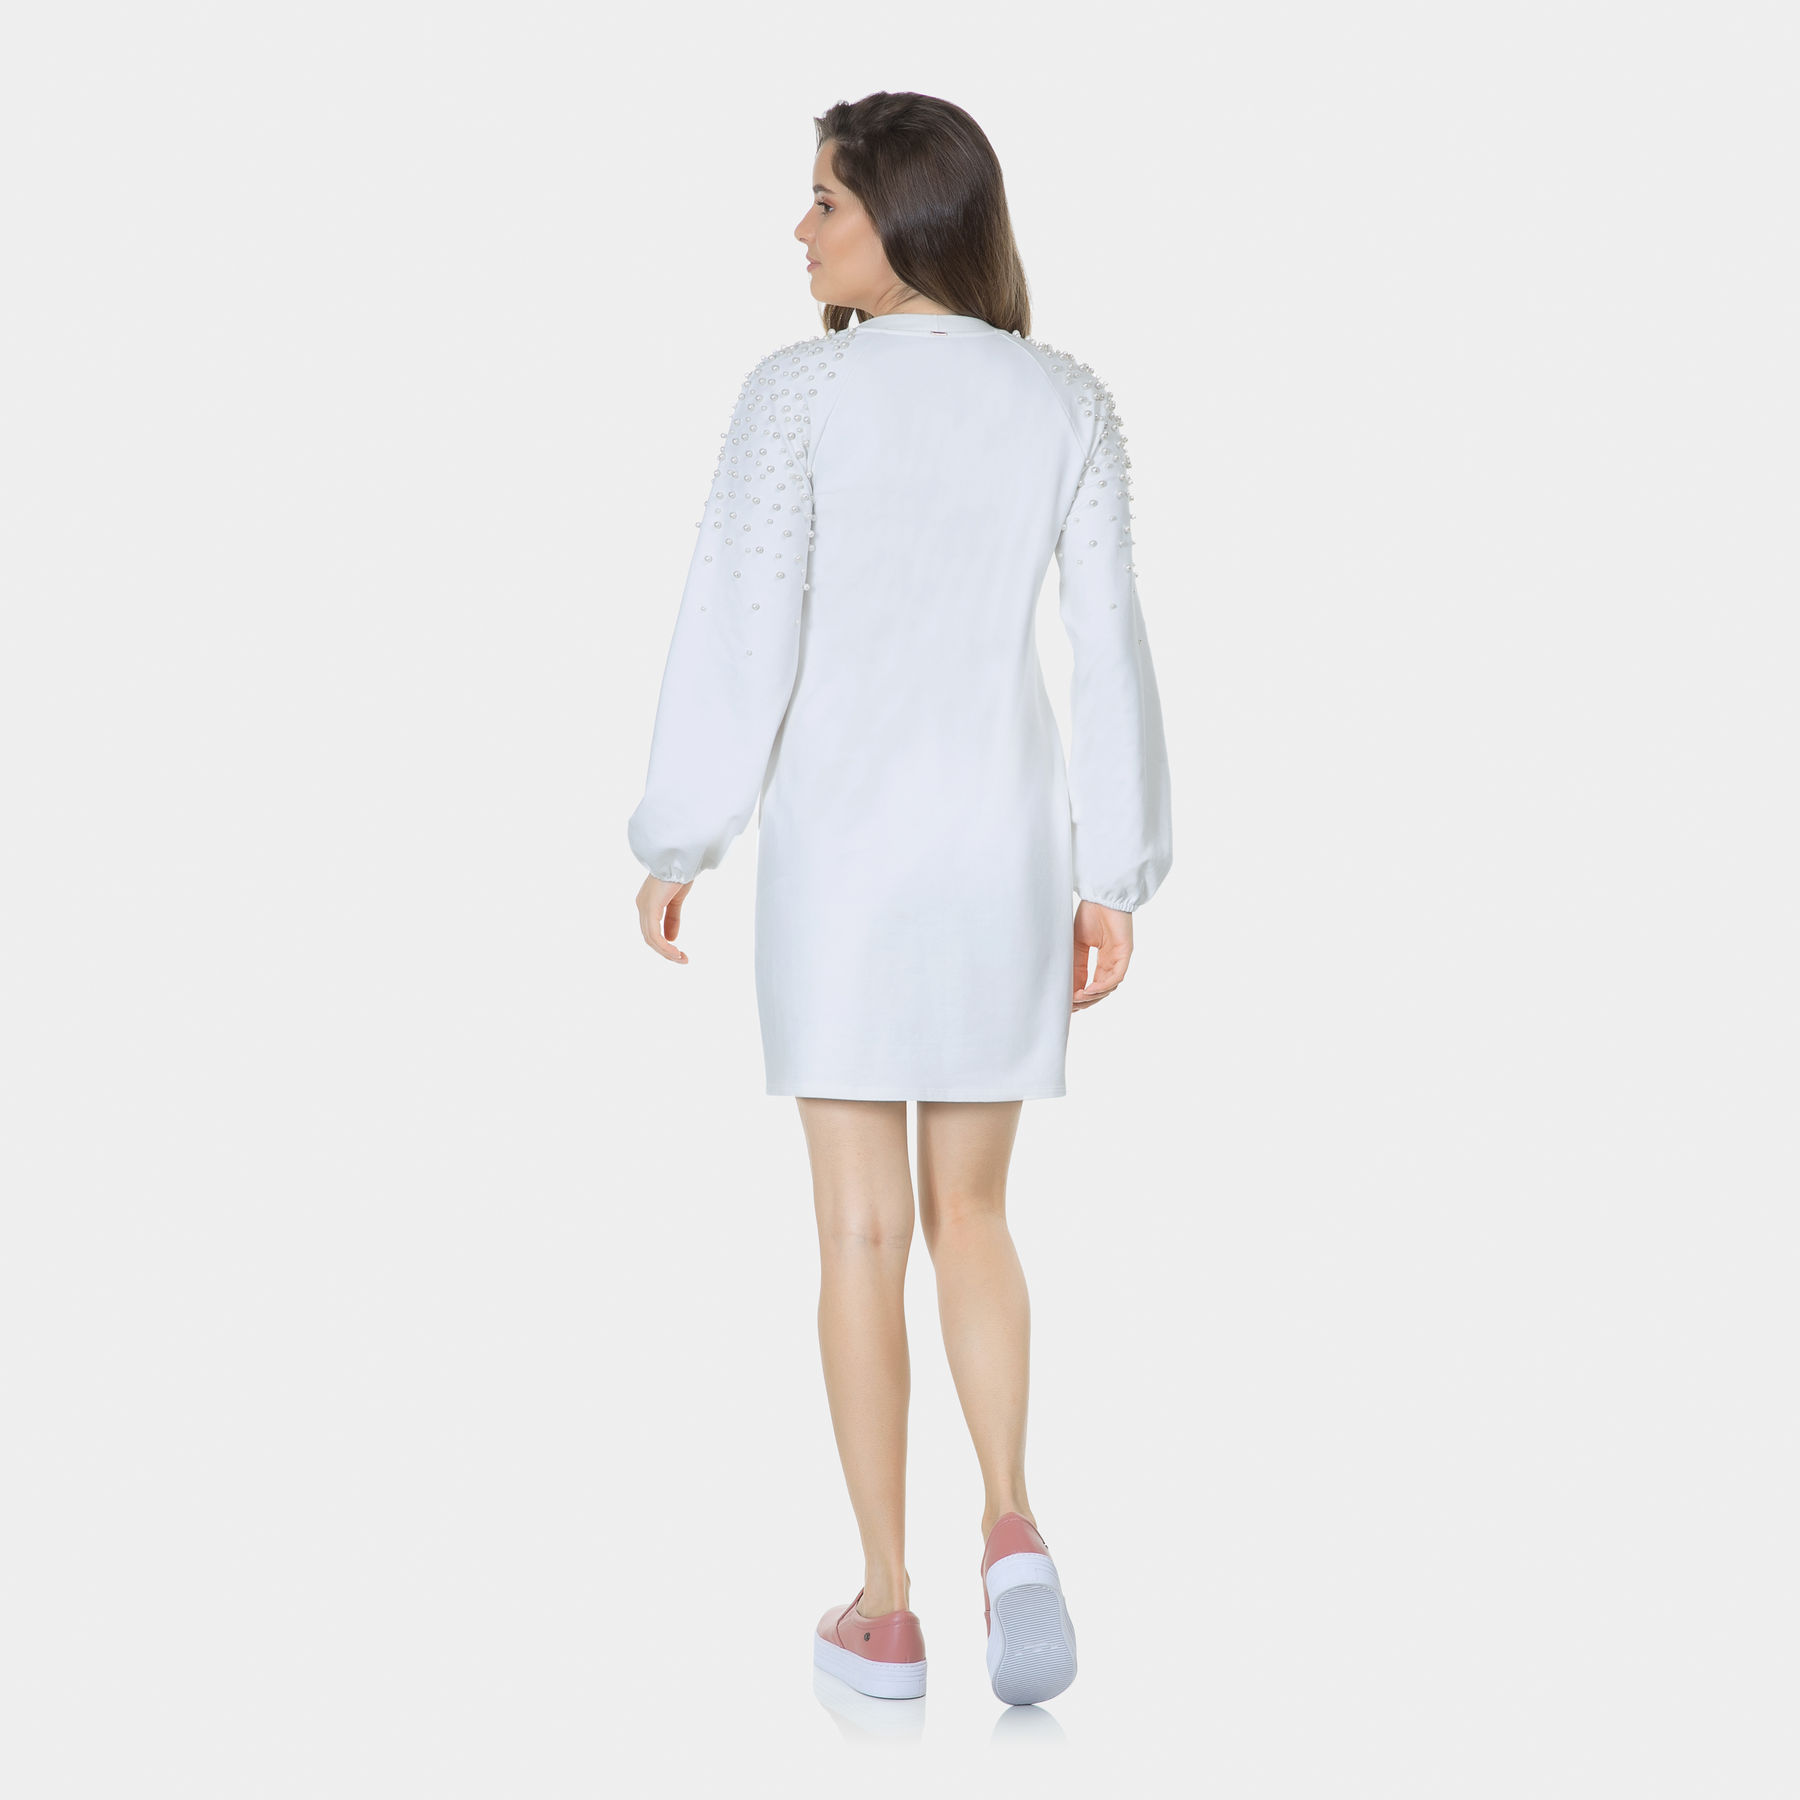 383084ac4 Vestido Manga Longa Pérolas Branco Off White - Lez a Lez